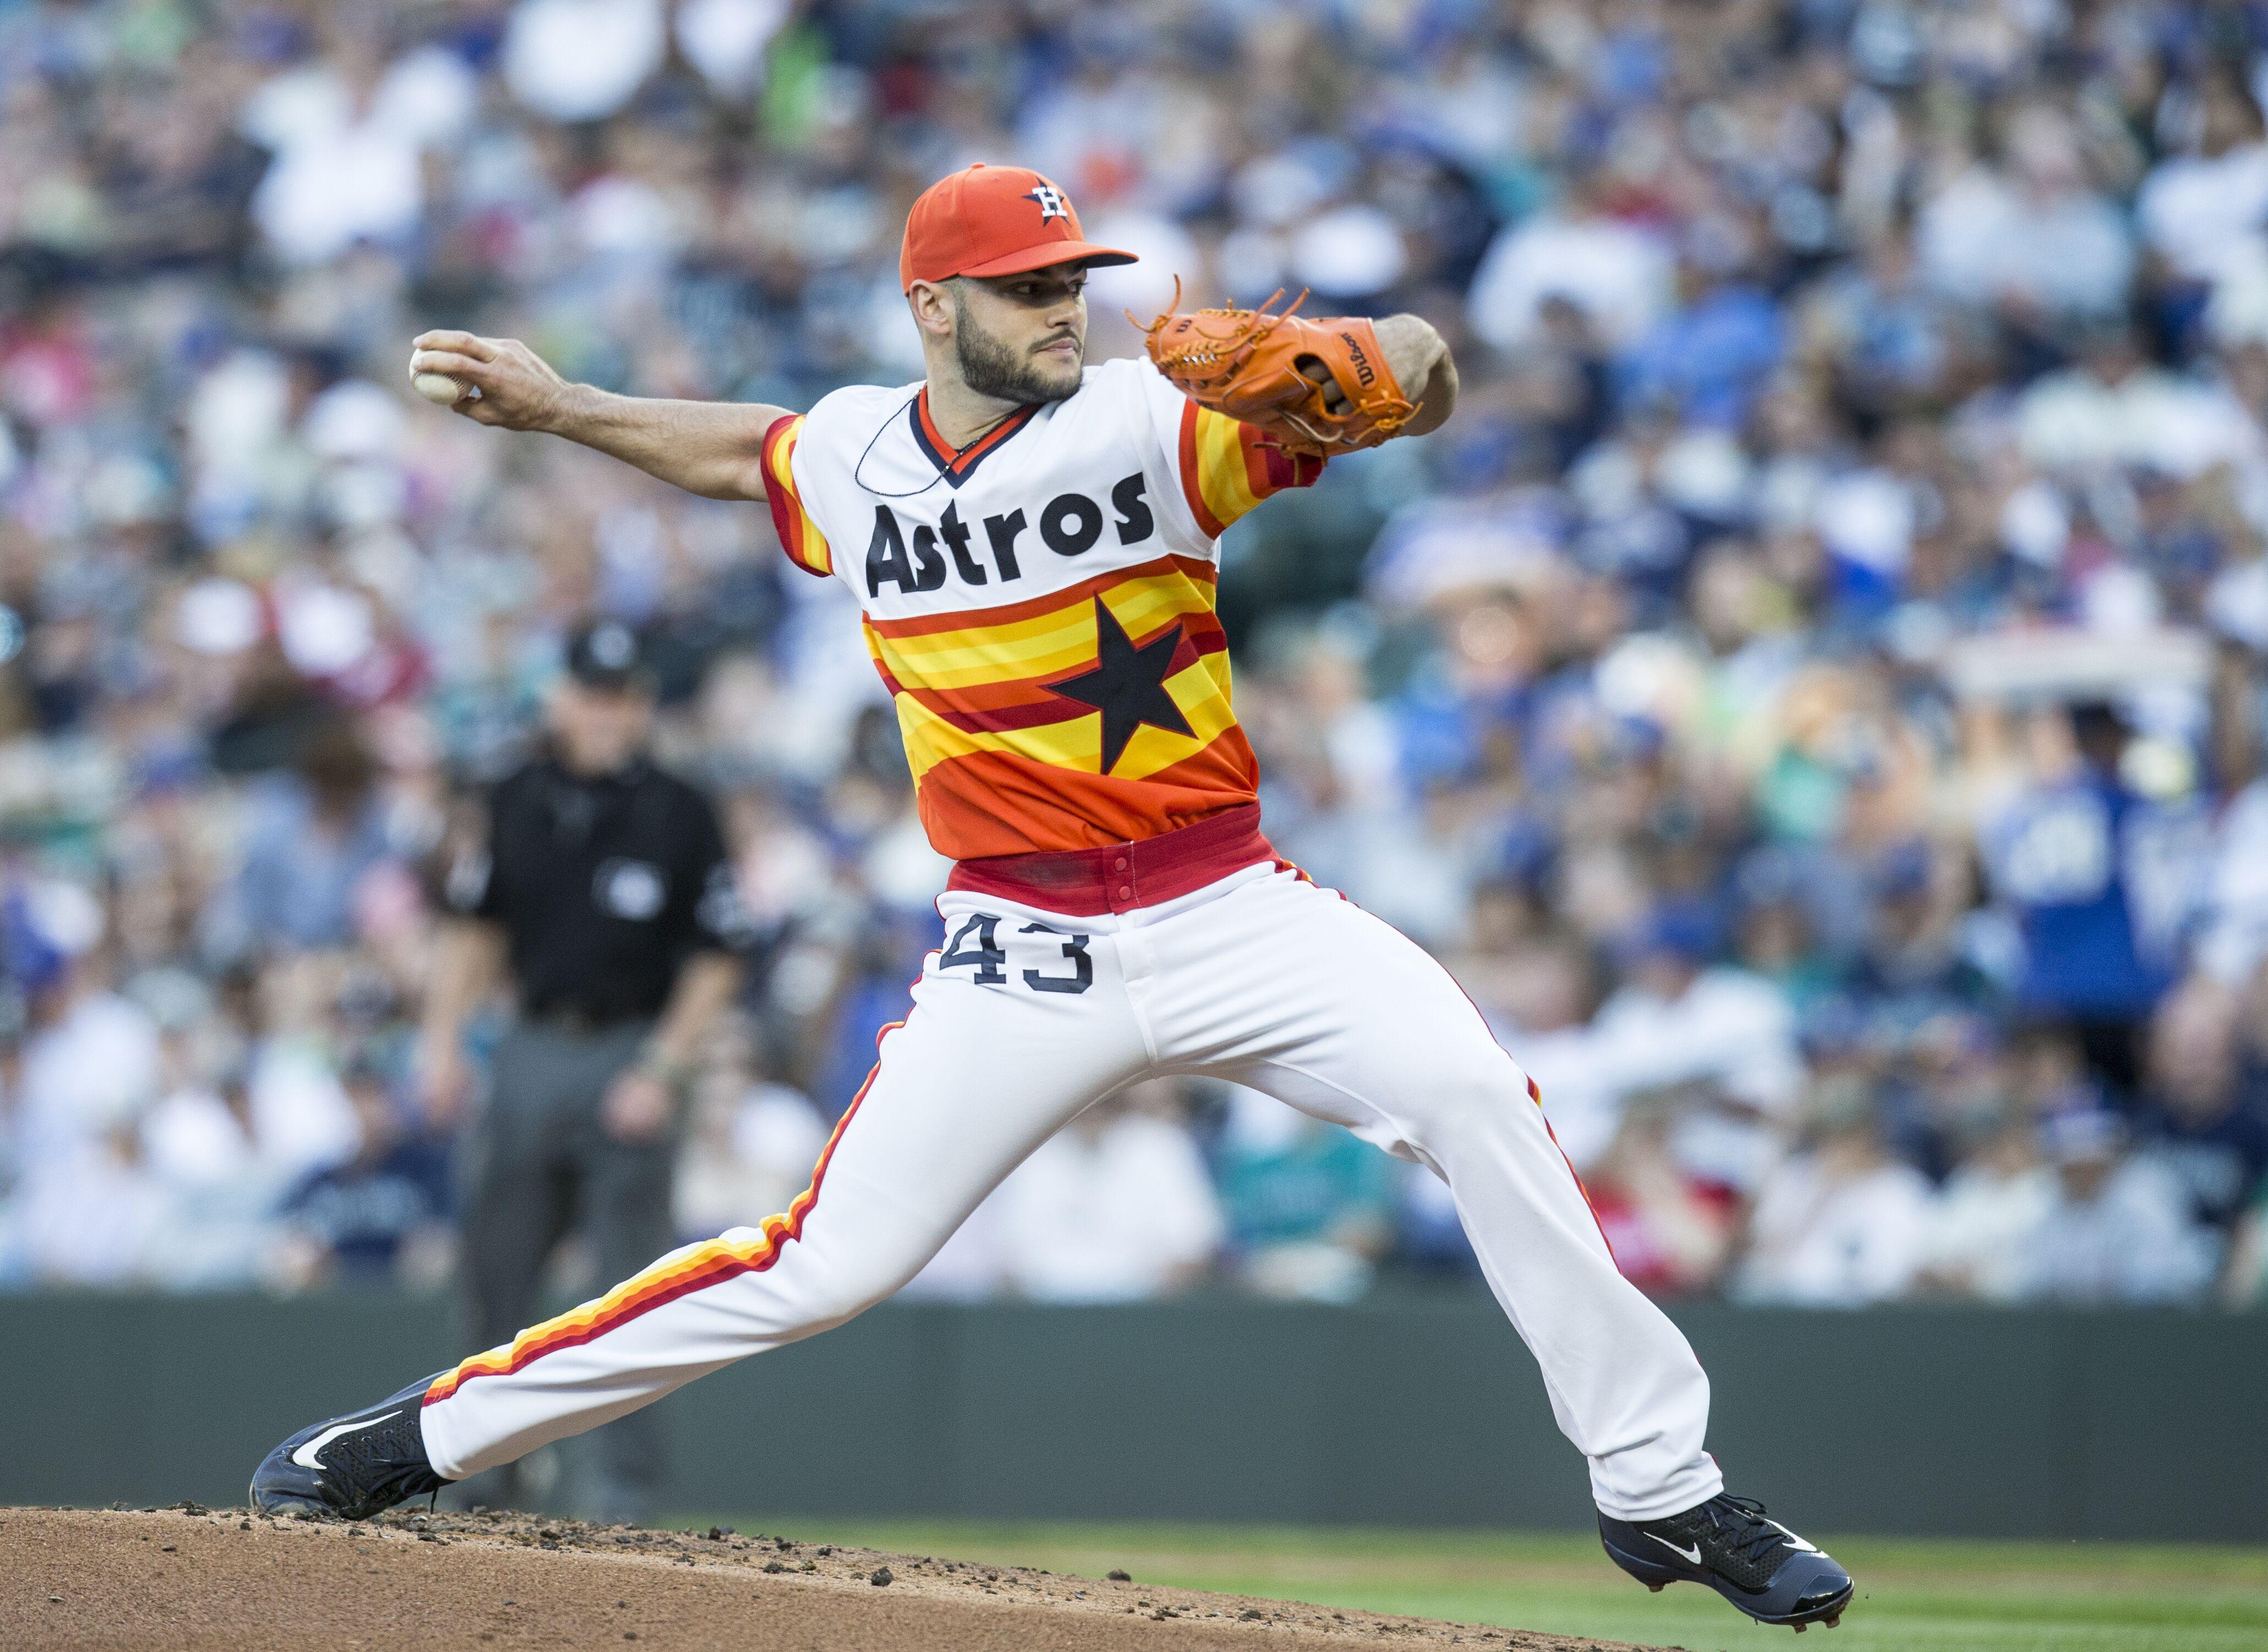 sports shoes e2c3a e32c1 Houston Astros Report: The evolution of the rainbow uniform ...